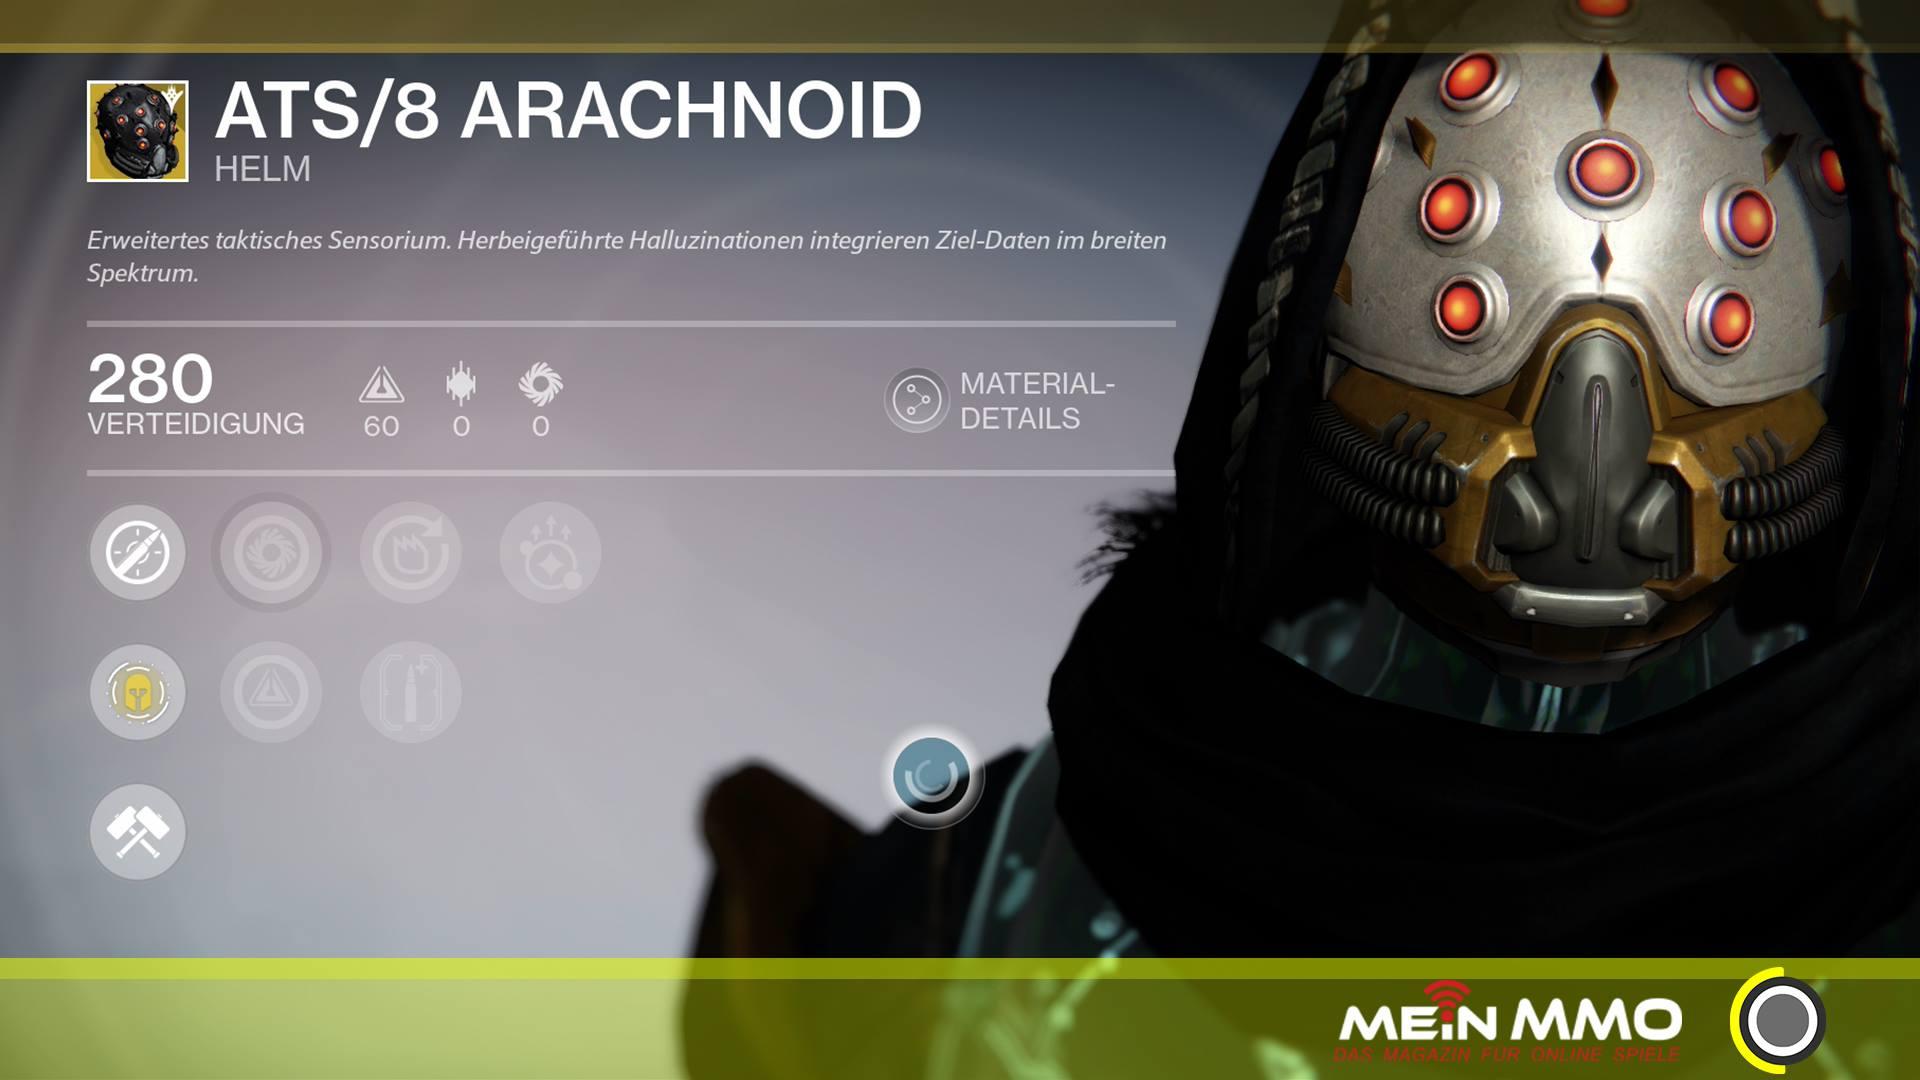 Destiny ATS 8 Arachnoid Helm